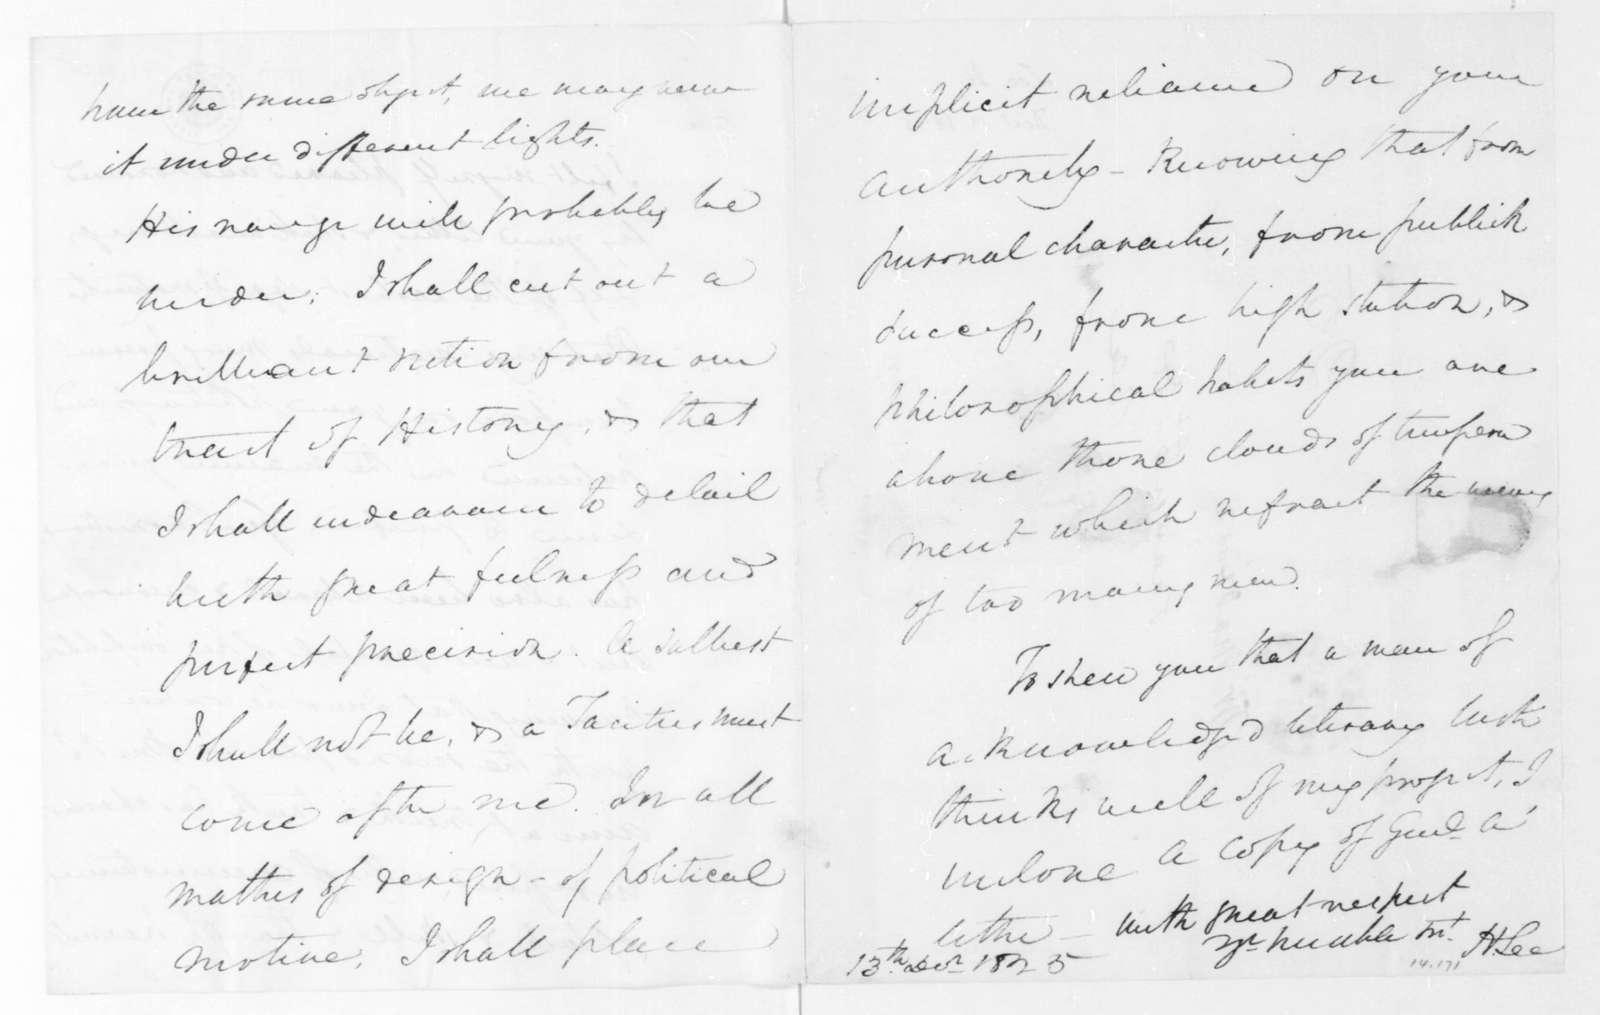 Henry Lee to James Madison, December 13, 1825.